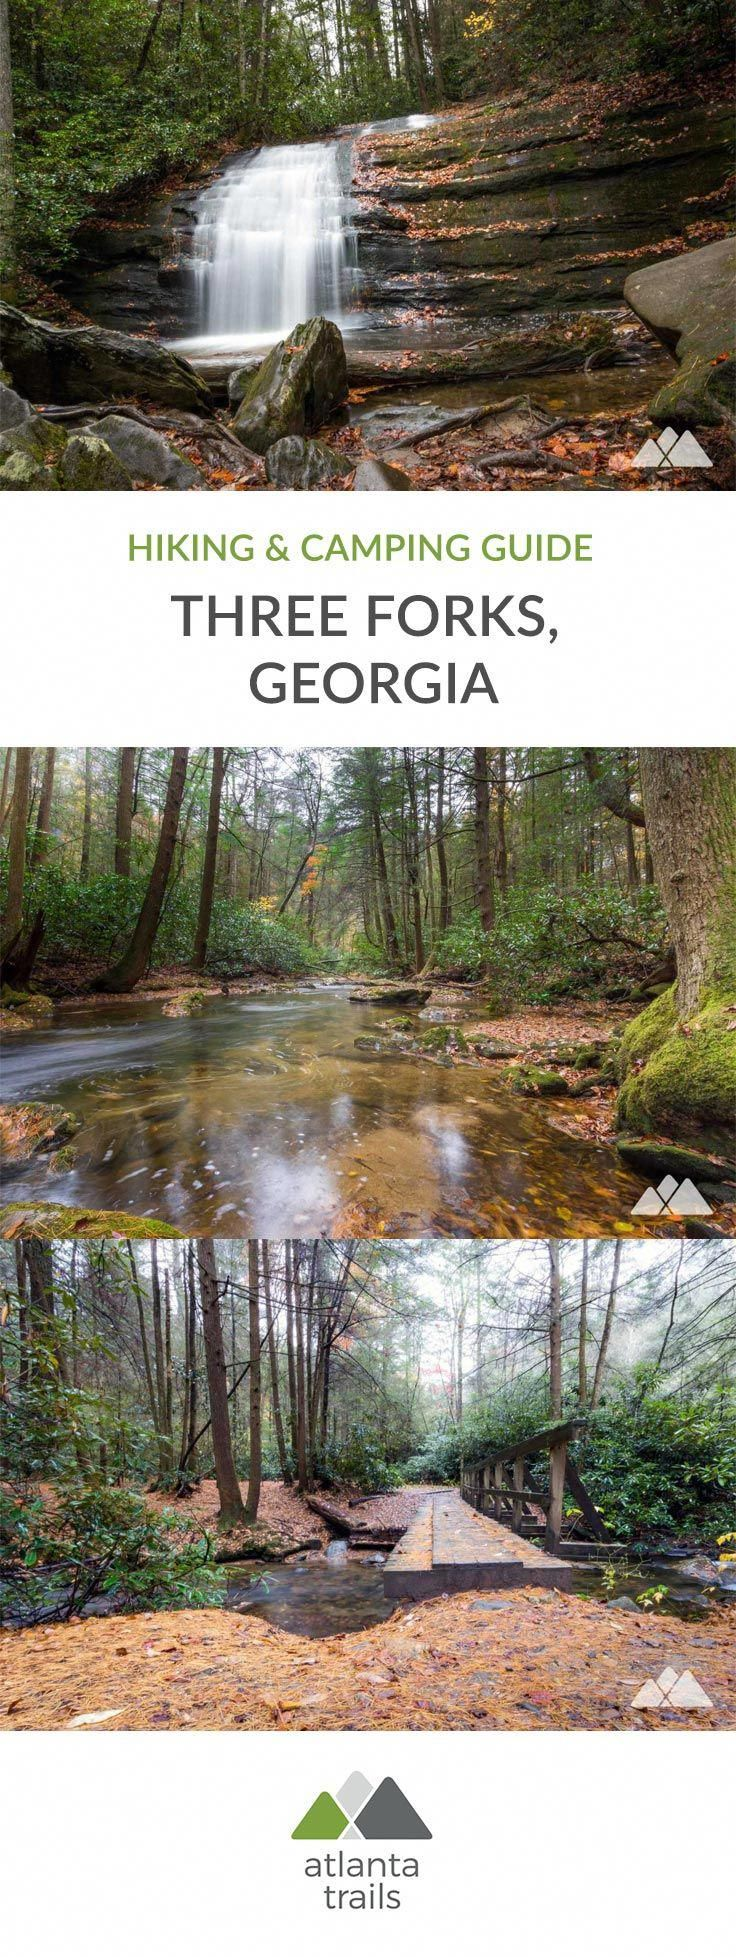 Hike, backpack and camp the beautiful, shady, waterfall